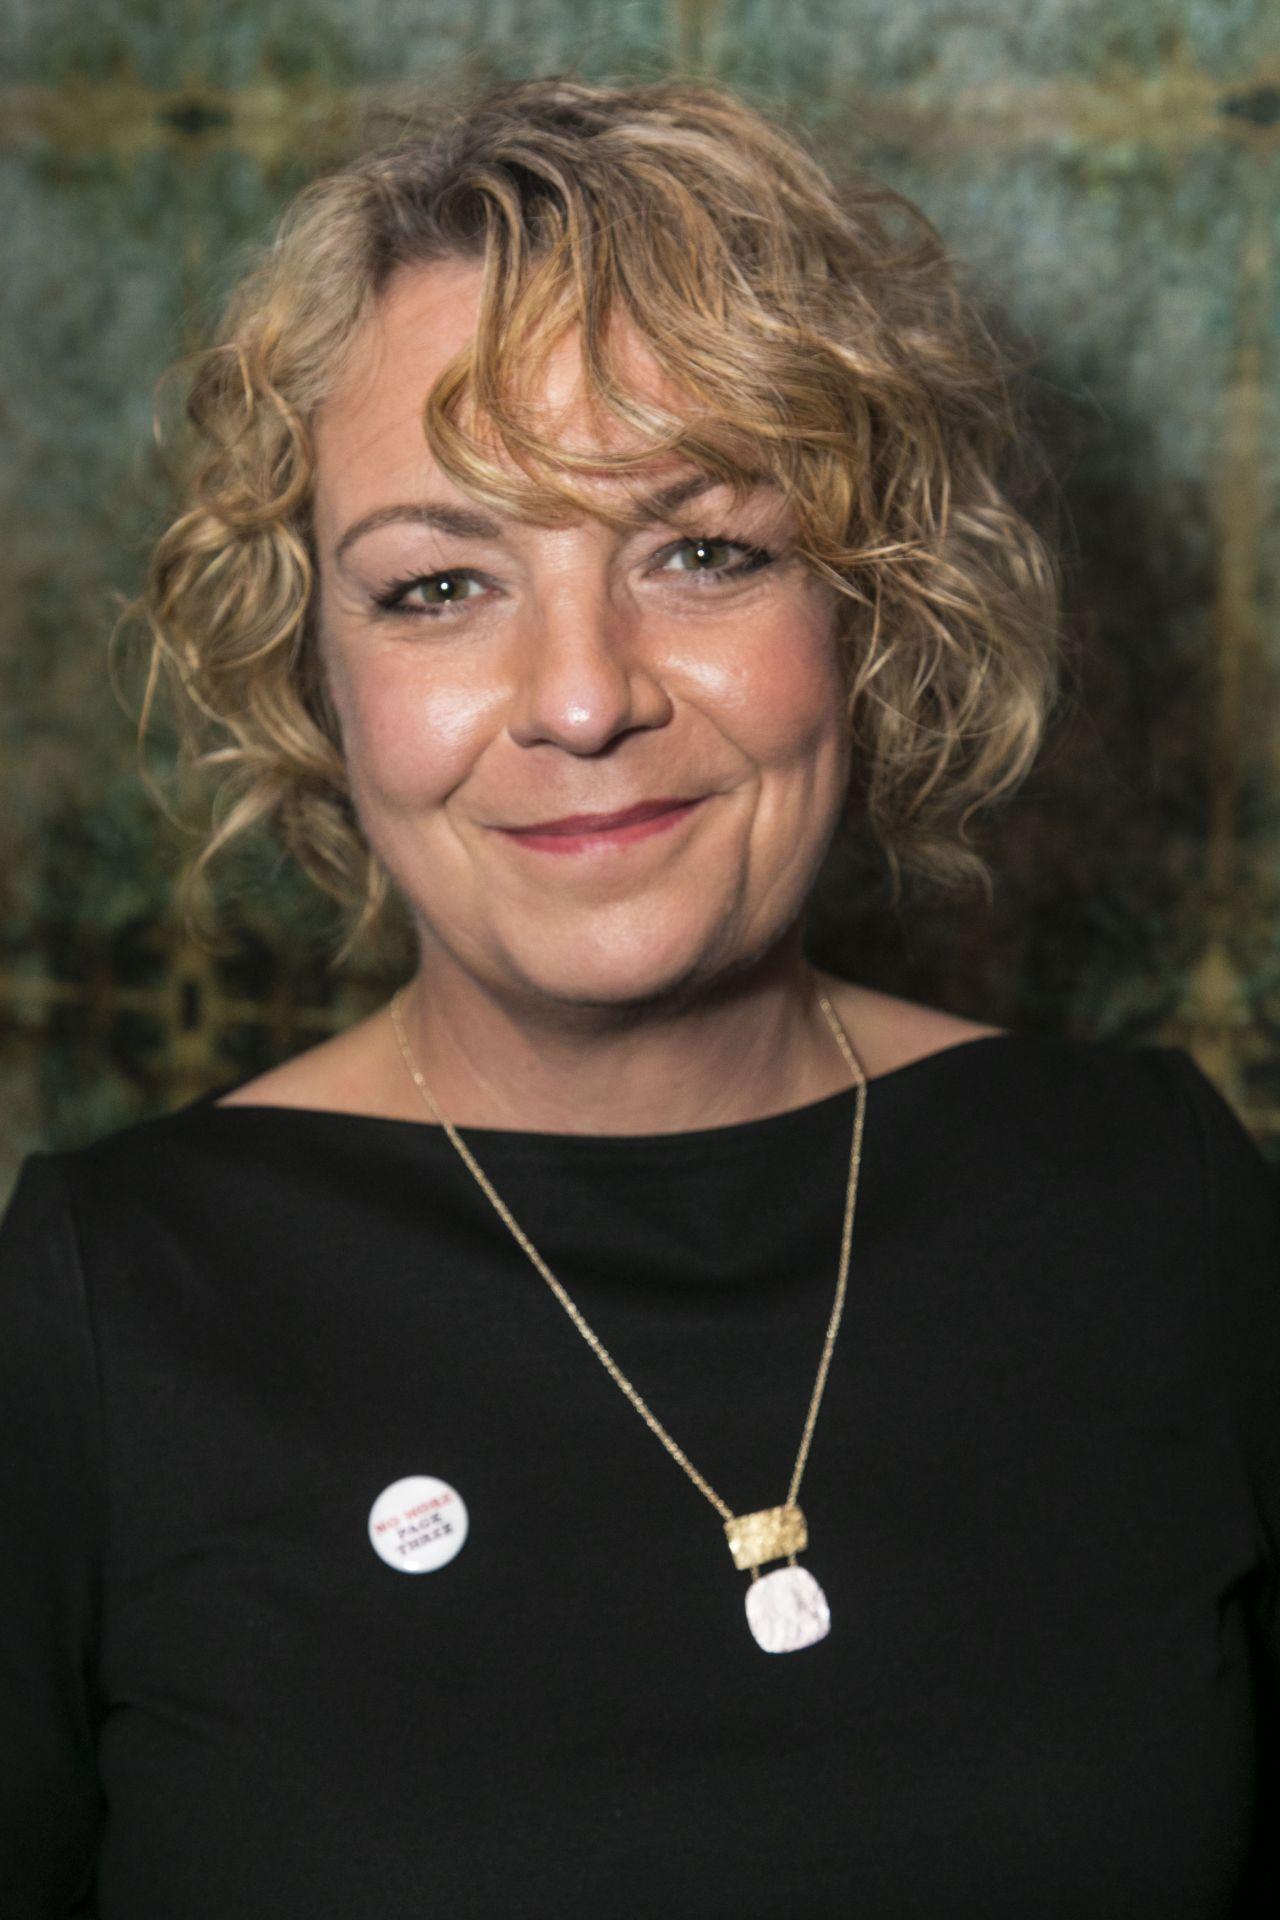 Sophie Stanton